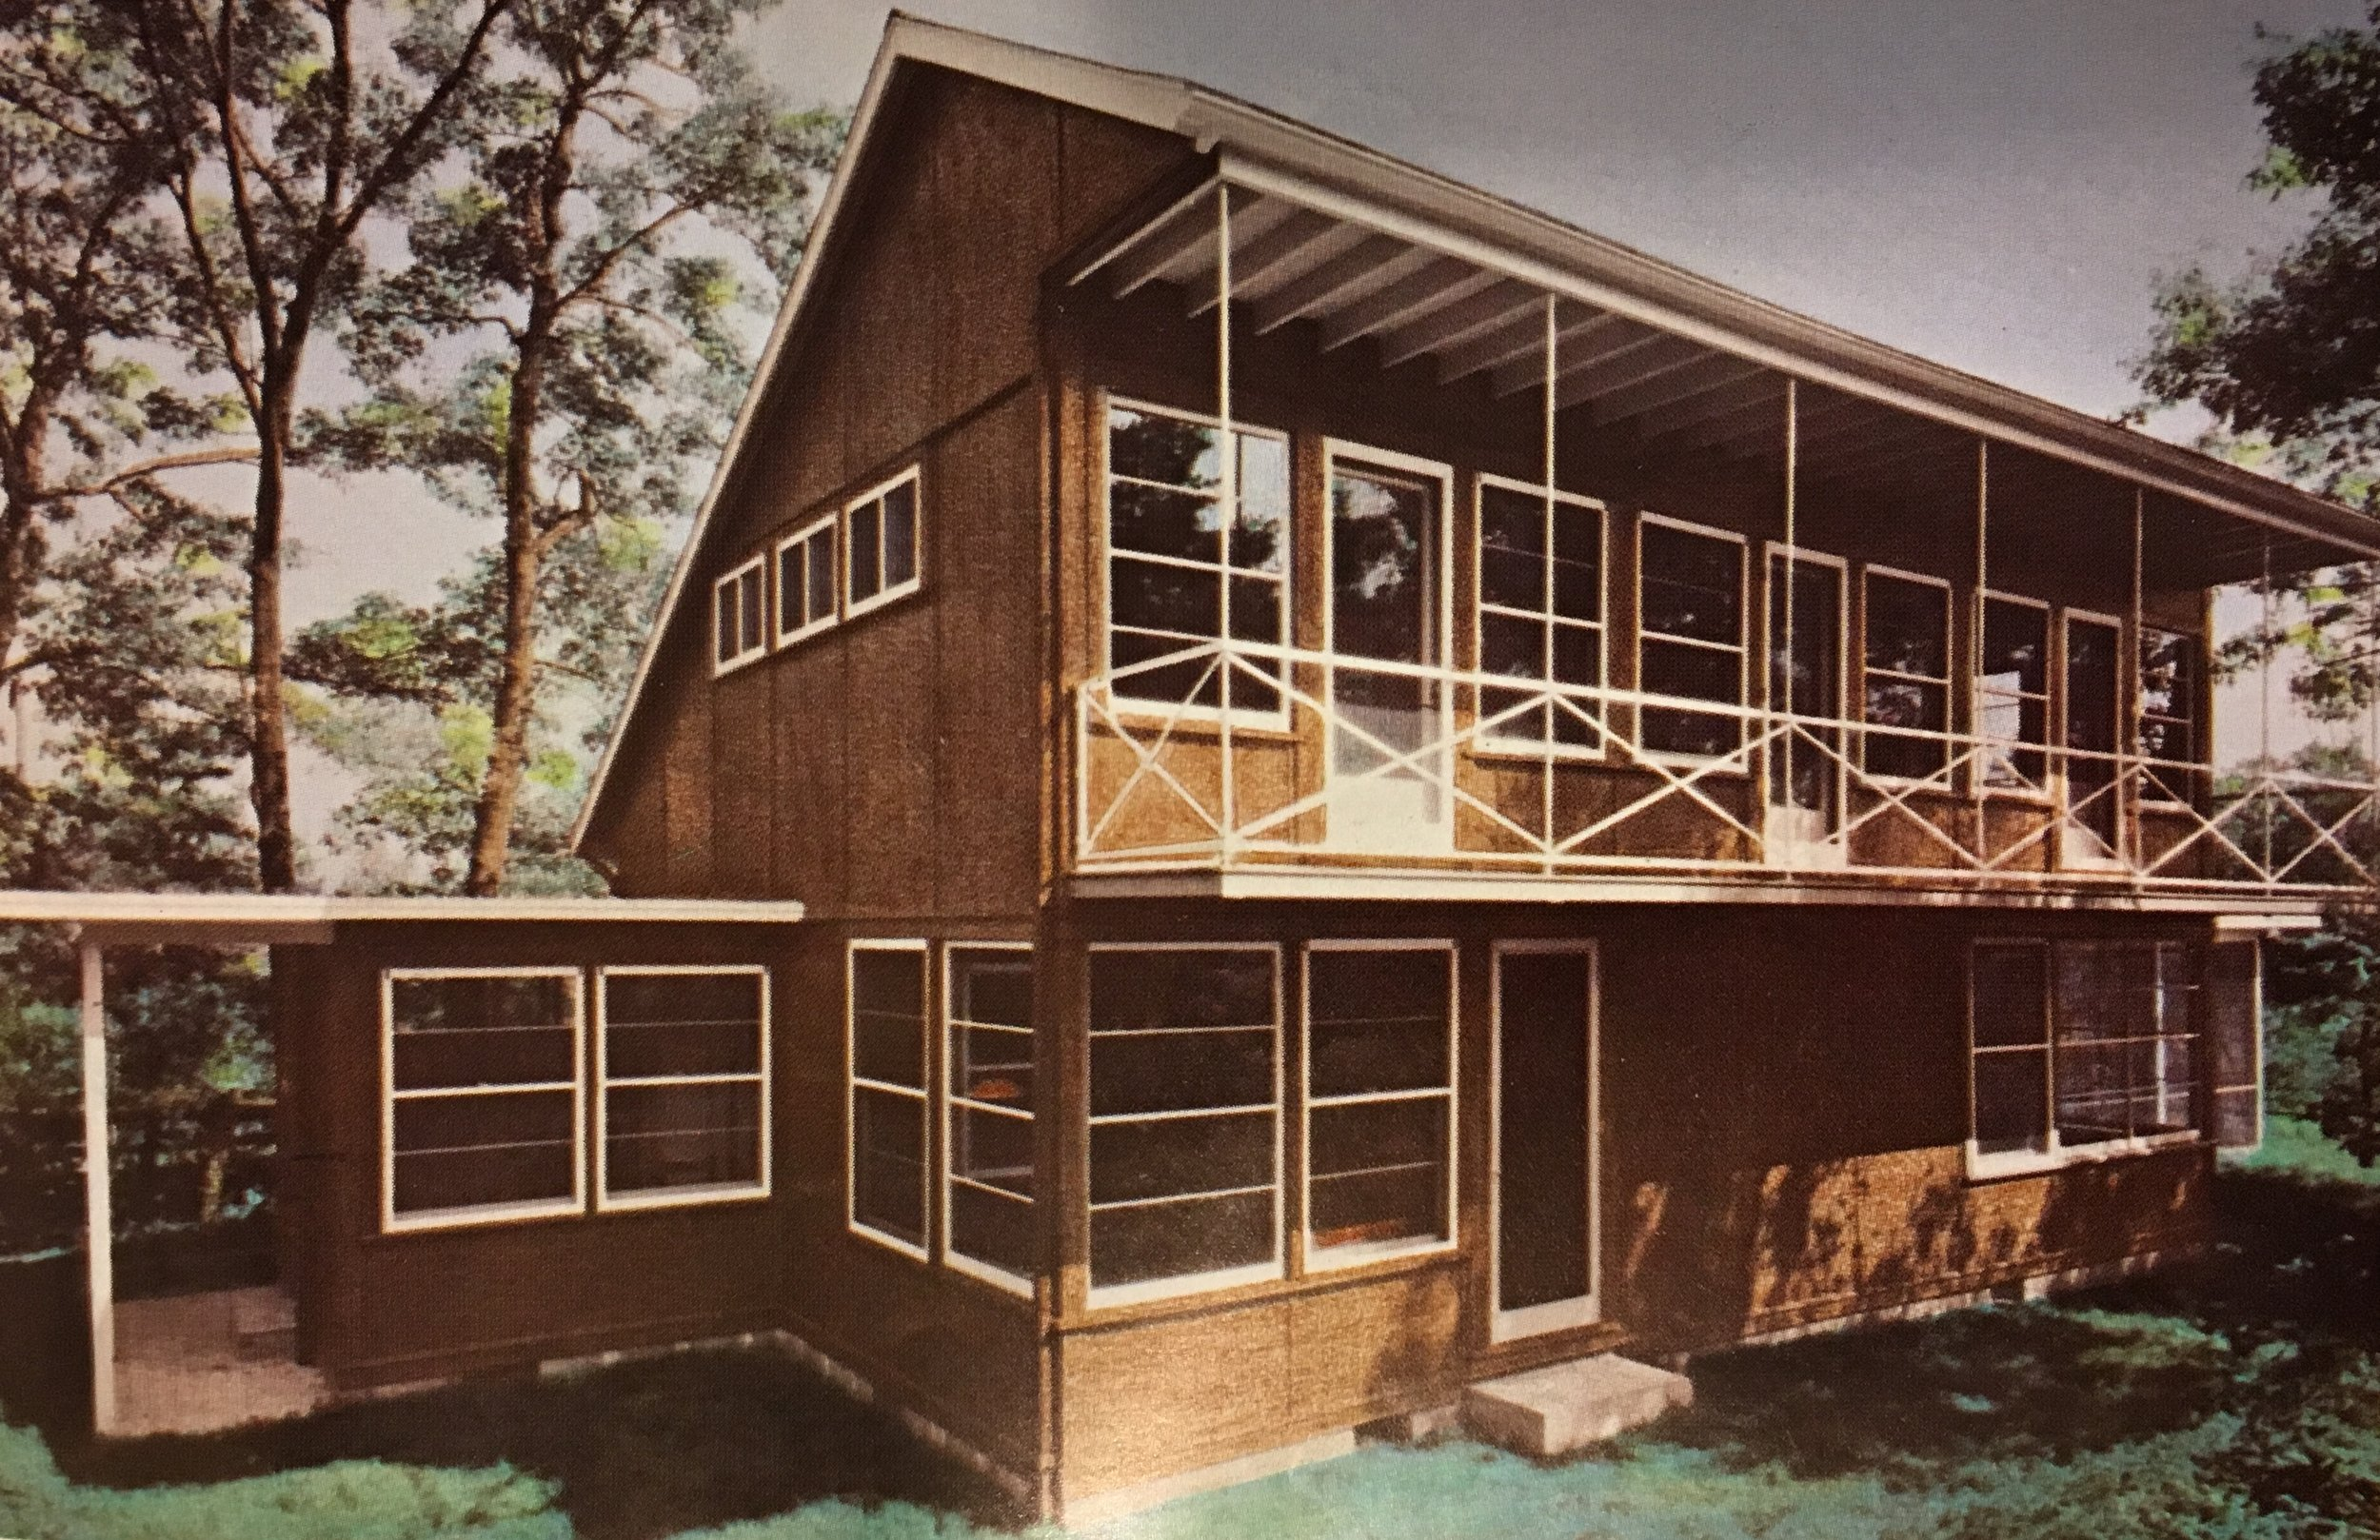 Fig 8: Eleanor Raymond. Plywood House, Interior Cabinetry, Dover, Massachusetts, 1940. Status unknown. Eleanor Raymond, Architect by Doris Cole.